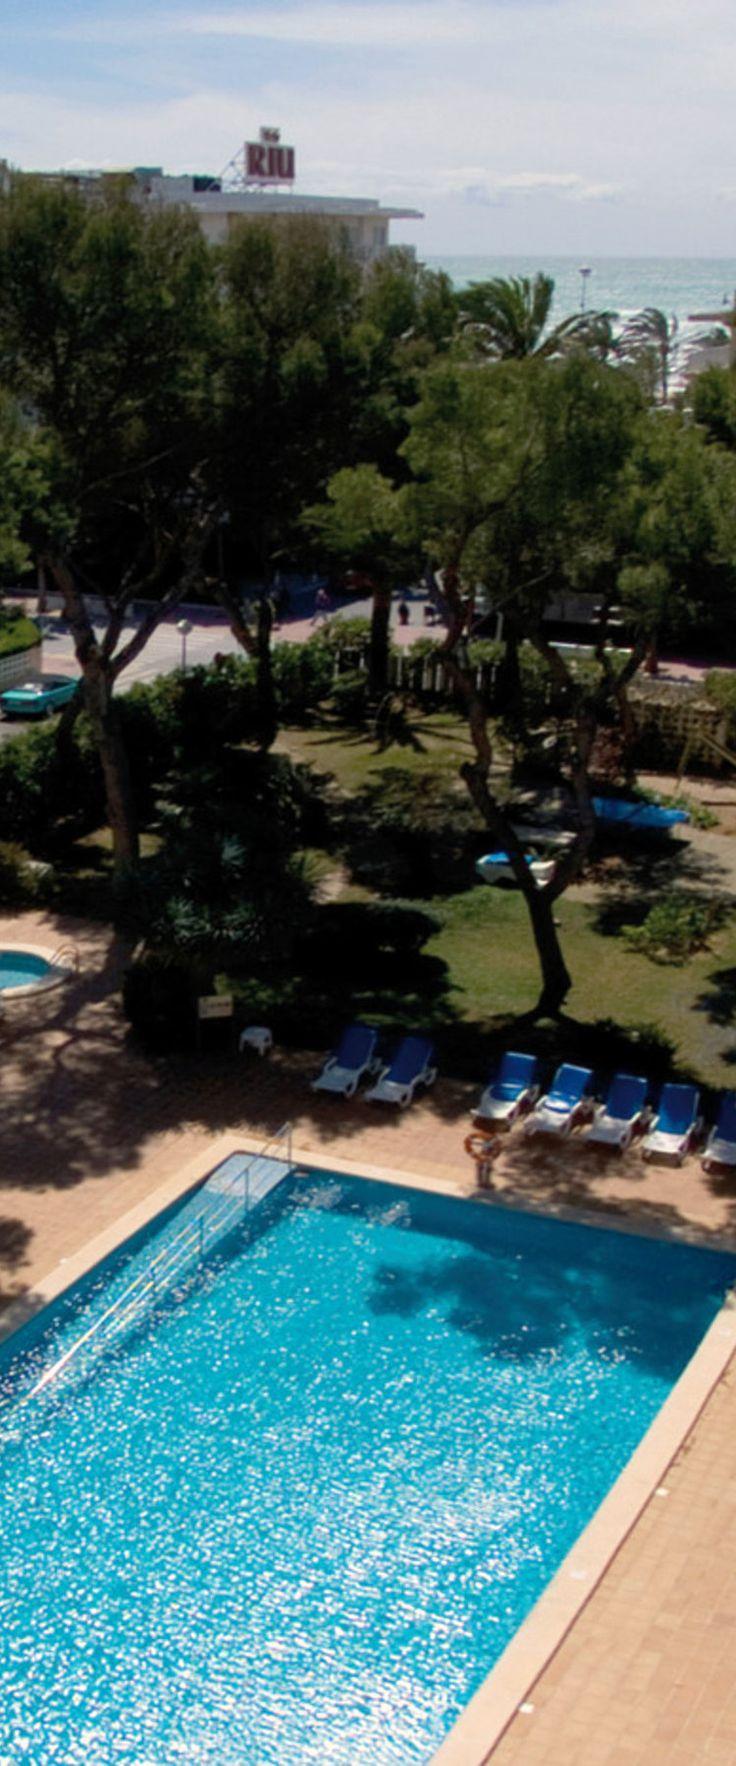 Pool and sea view in Mallorca - Hotel Riu Concordia - All Inclusive in Playa de Palma, Mallorca - Beach Hotels in Spain. | RIU Hotels & Resorts